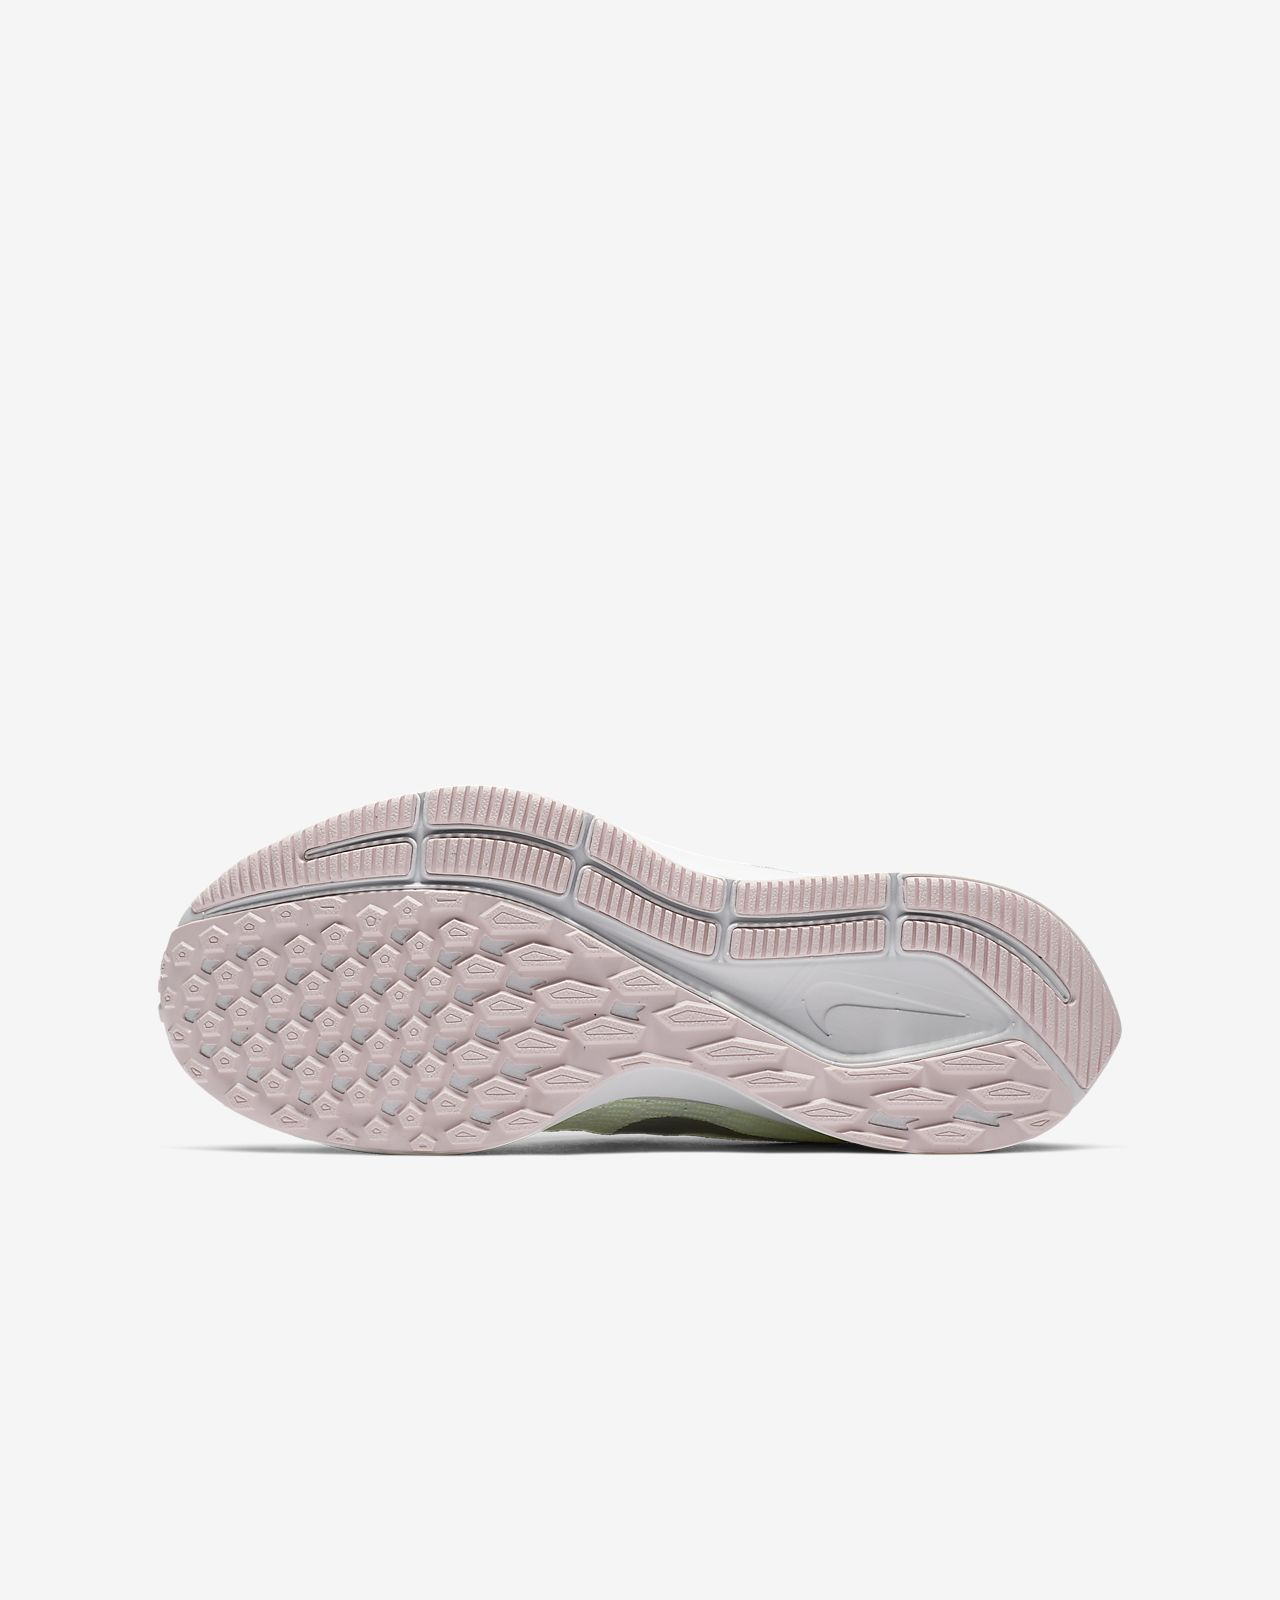 buy online f88ab bf86d ... Nike Air Zoom Pegasus 35 Younger Older Kids  Running Shoe